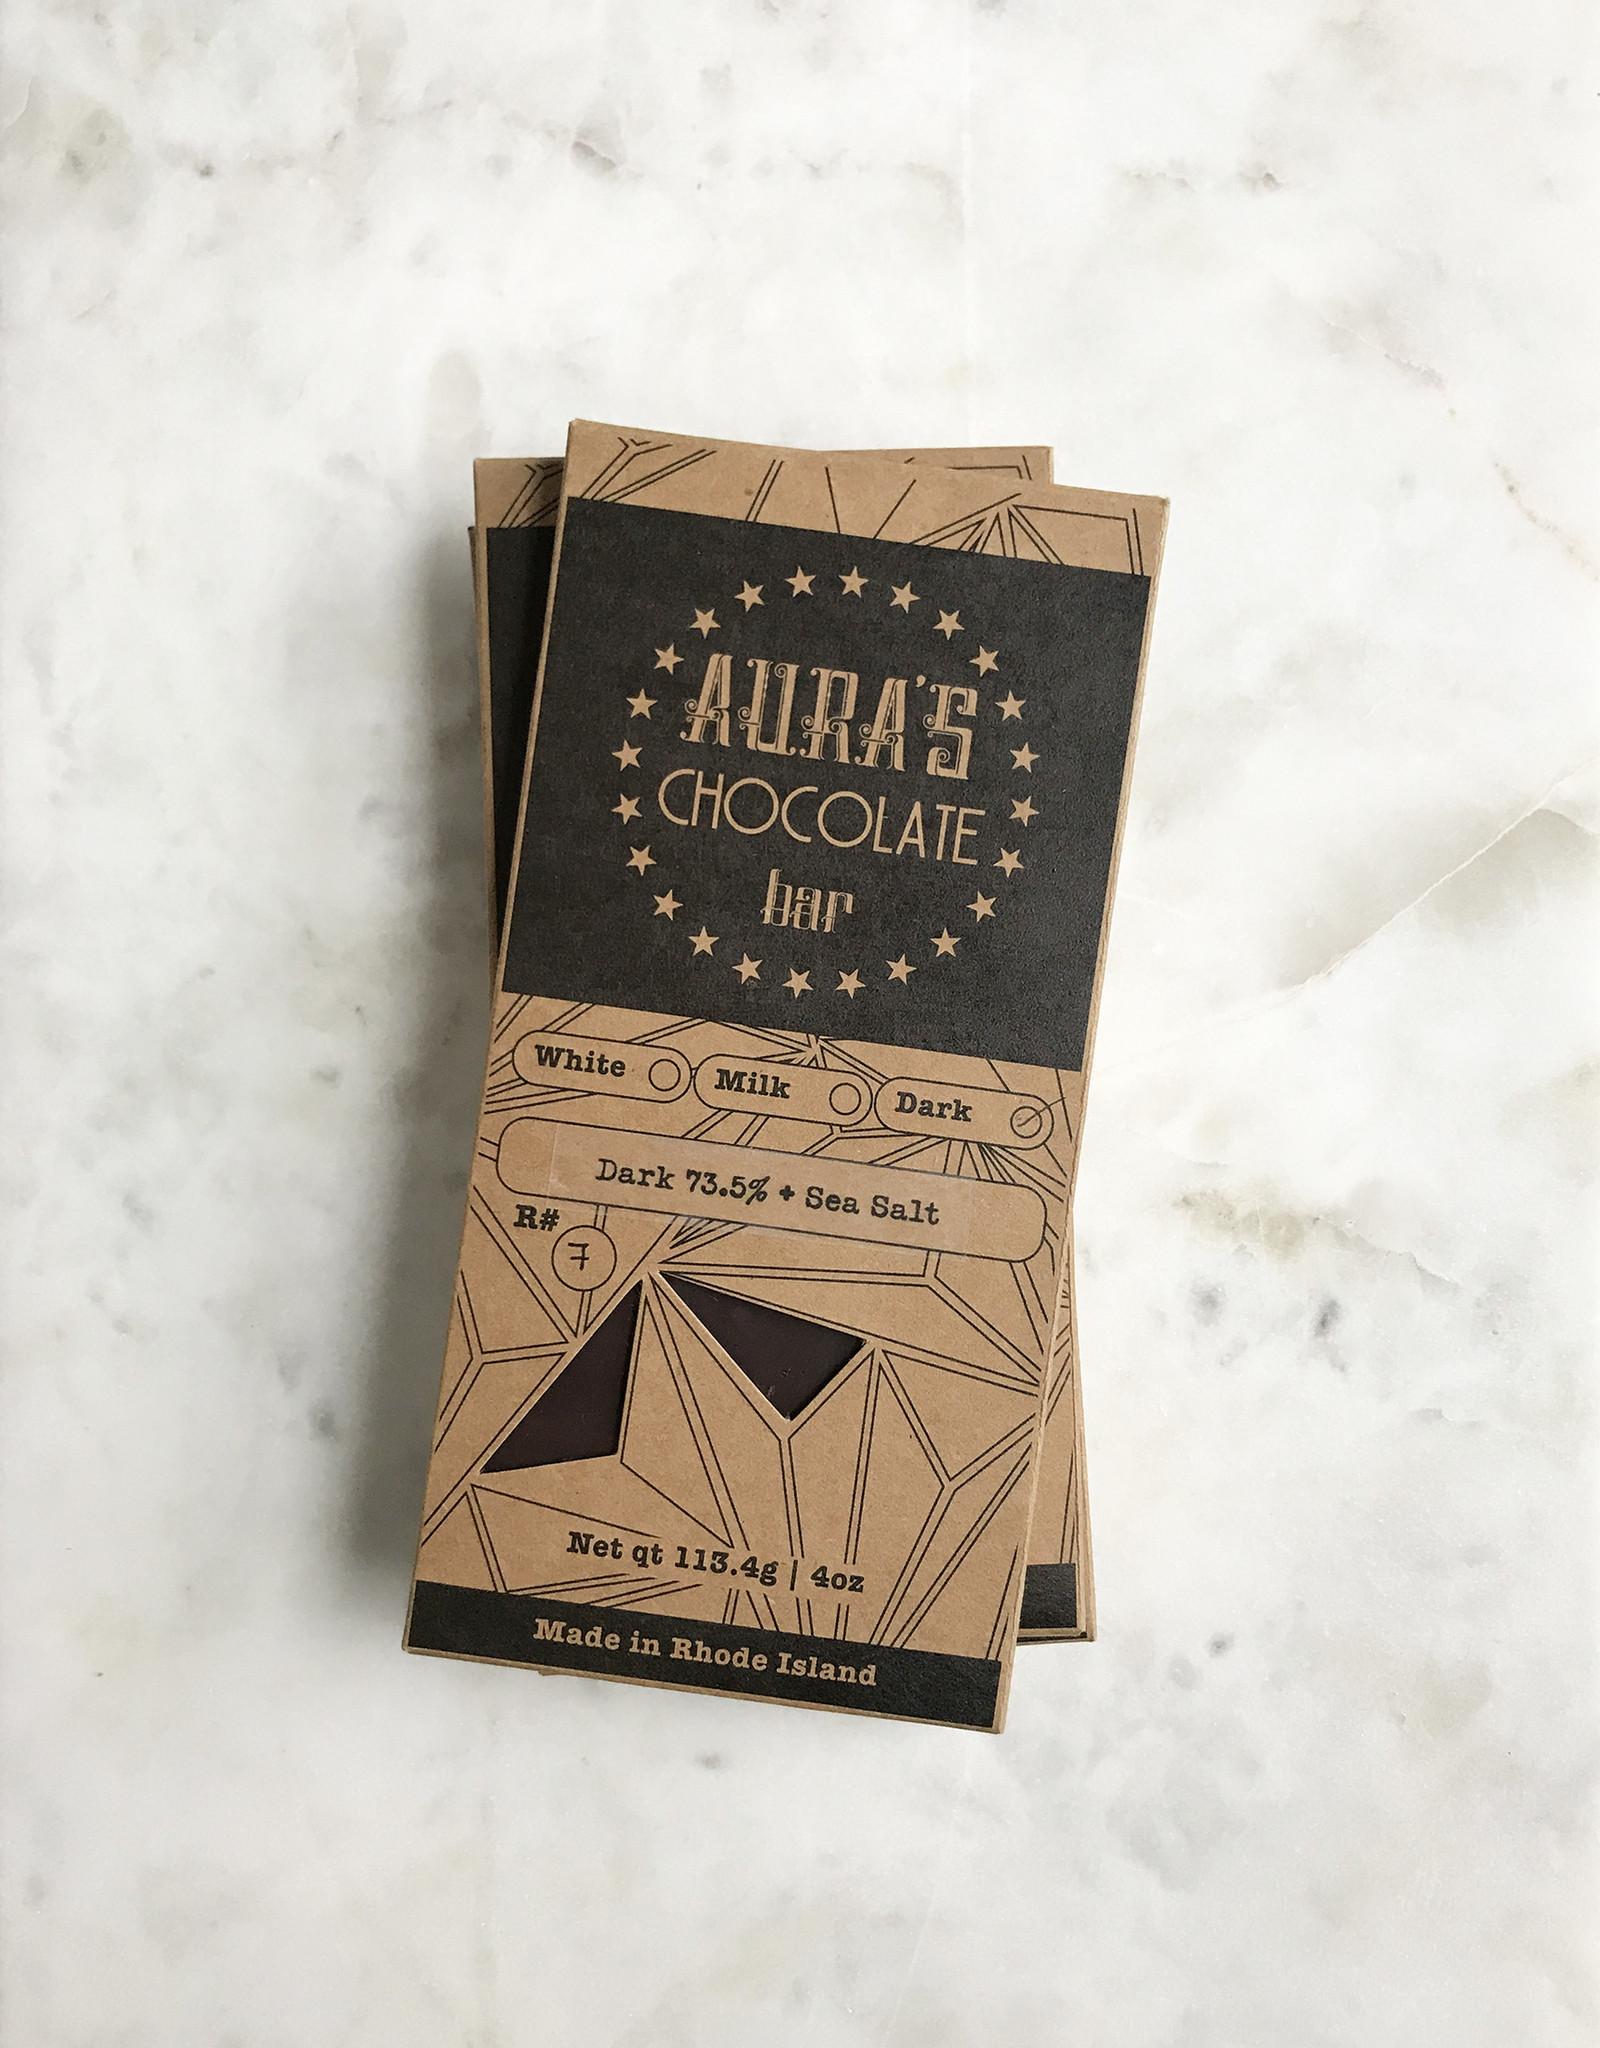 Aura Chocolate Aura's Chocolate Bar, 4oz.